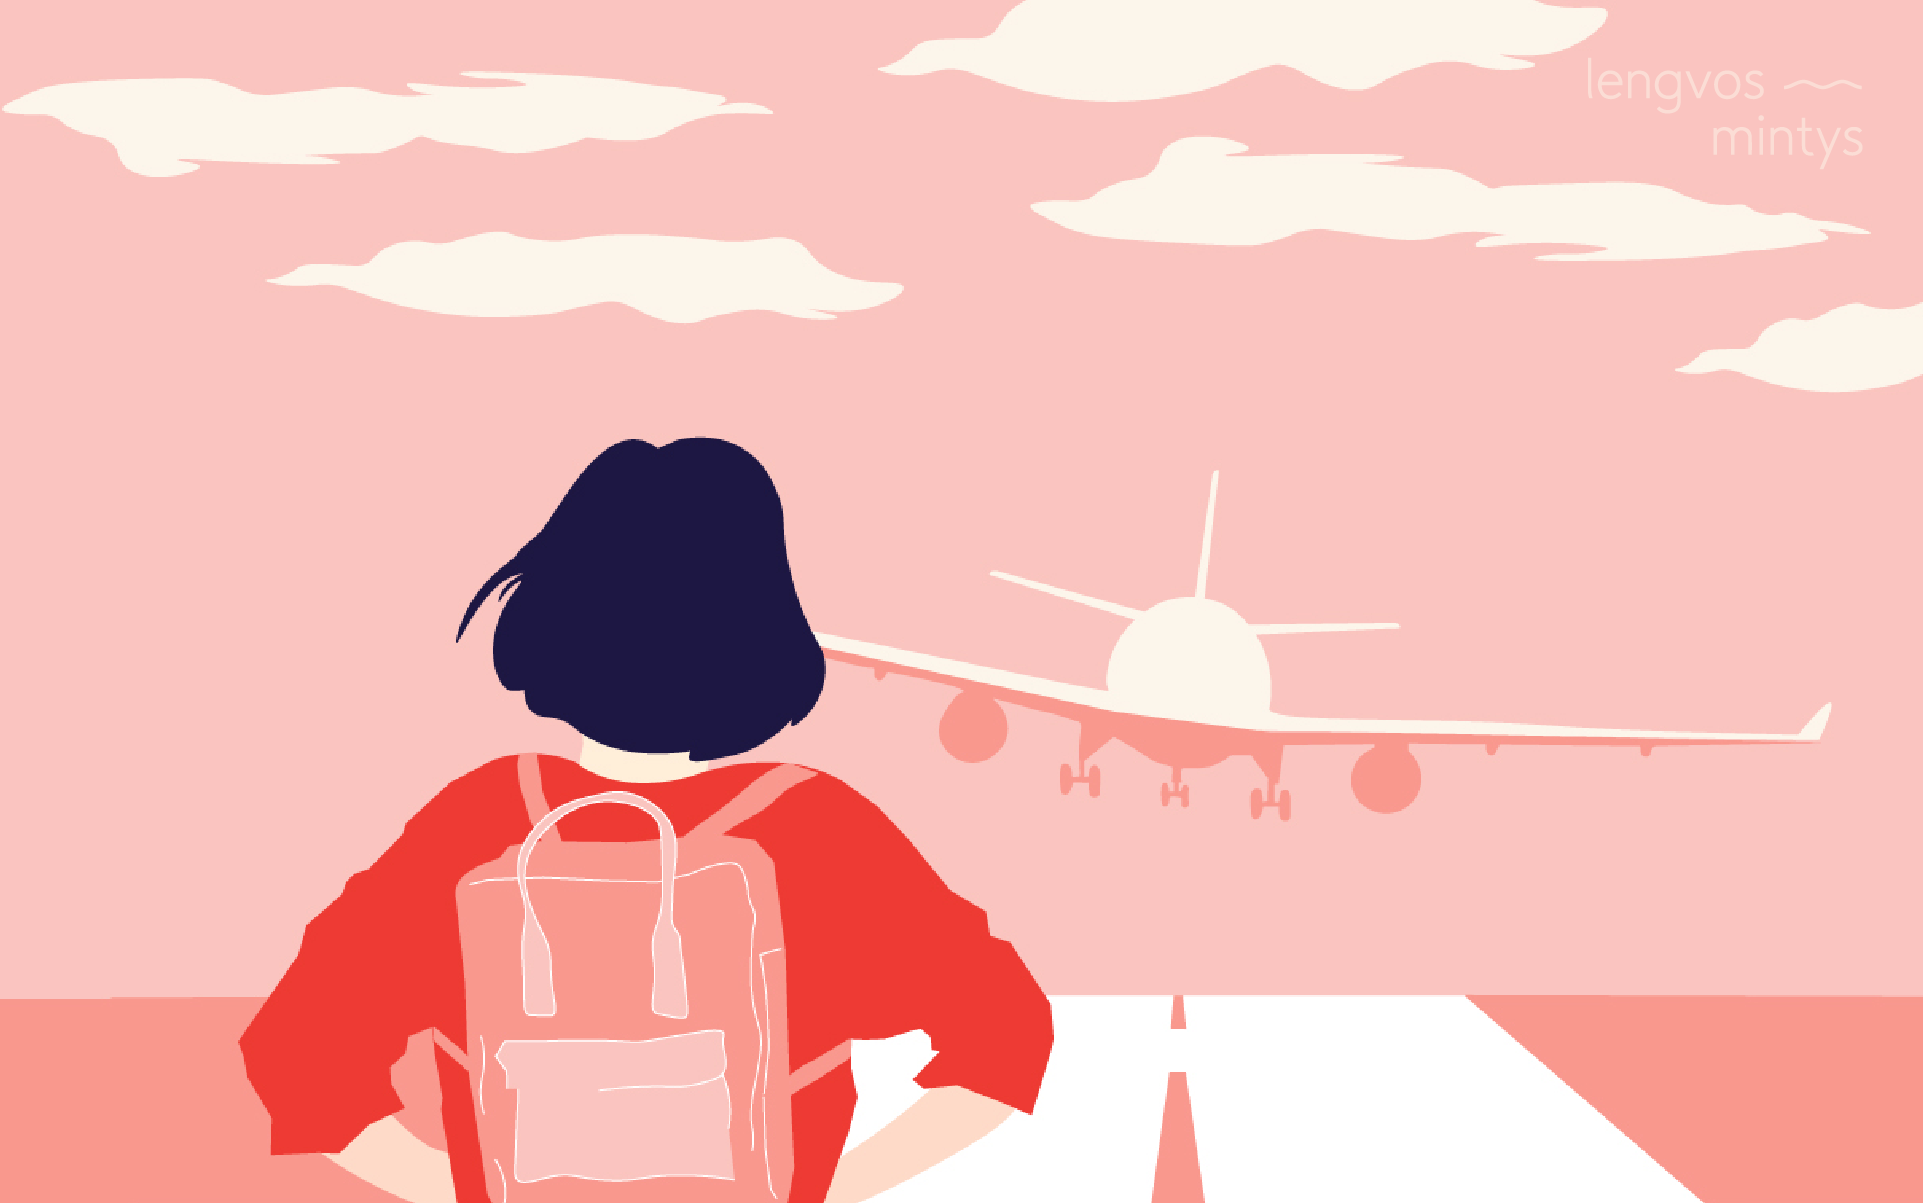 skrydzio baime aviafobija